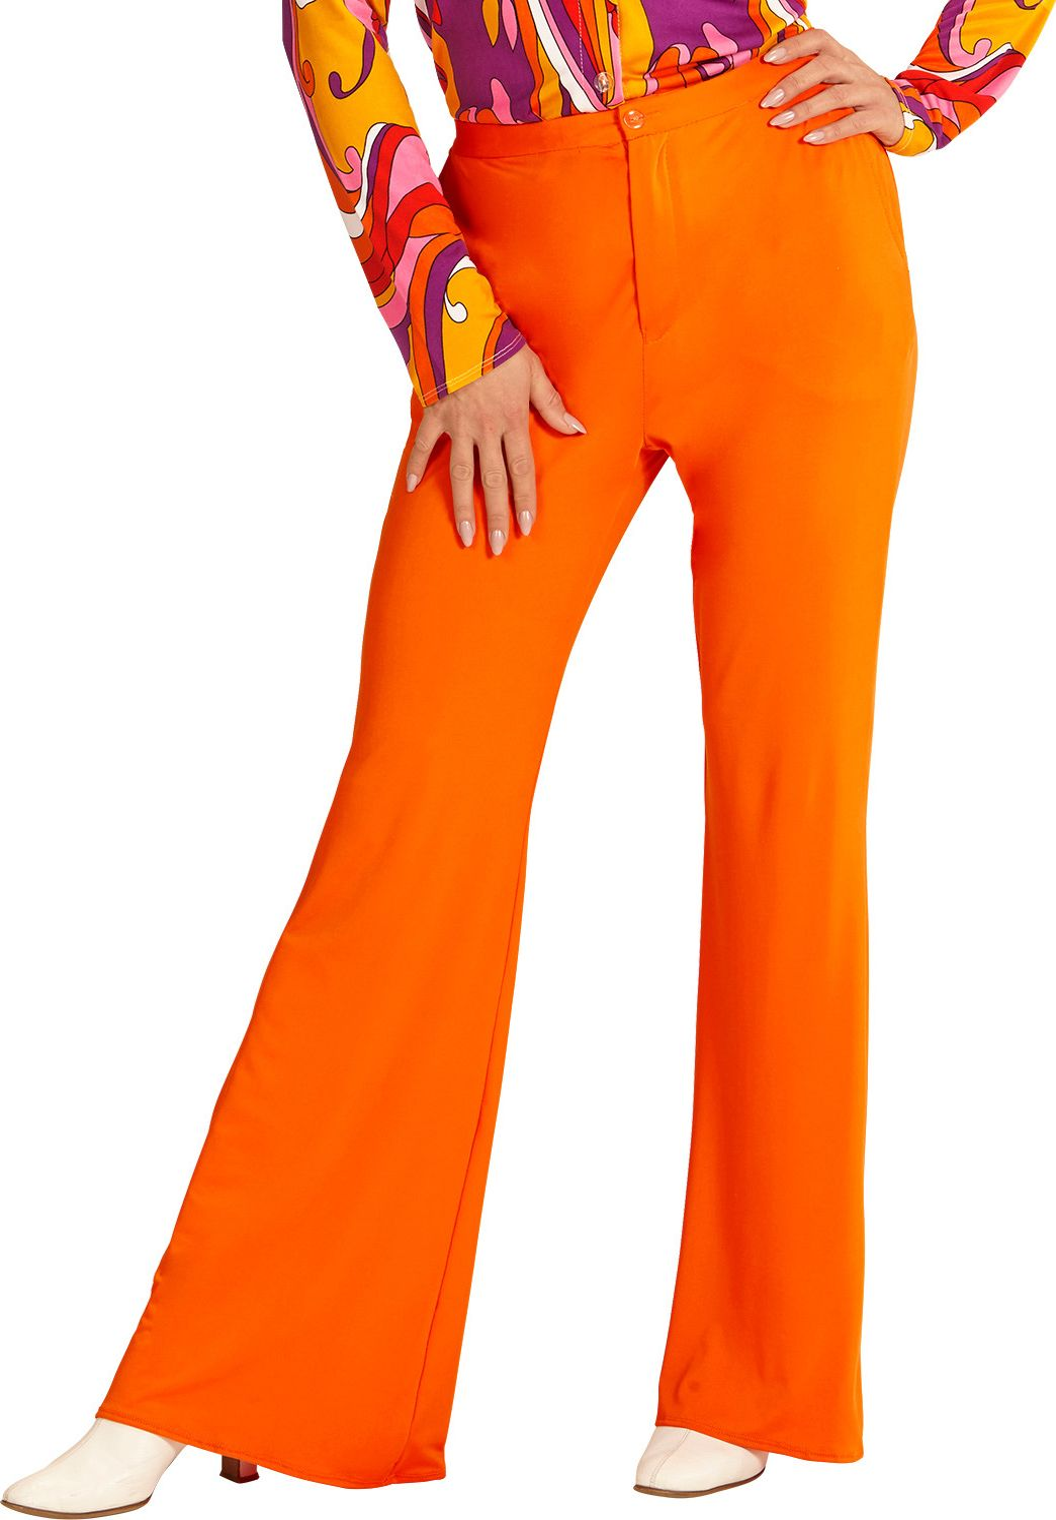 70s broek dames oranje